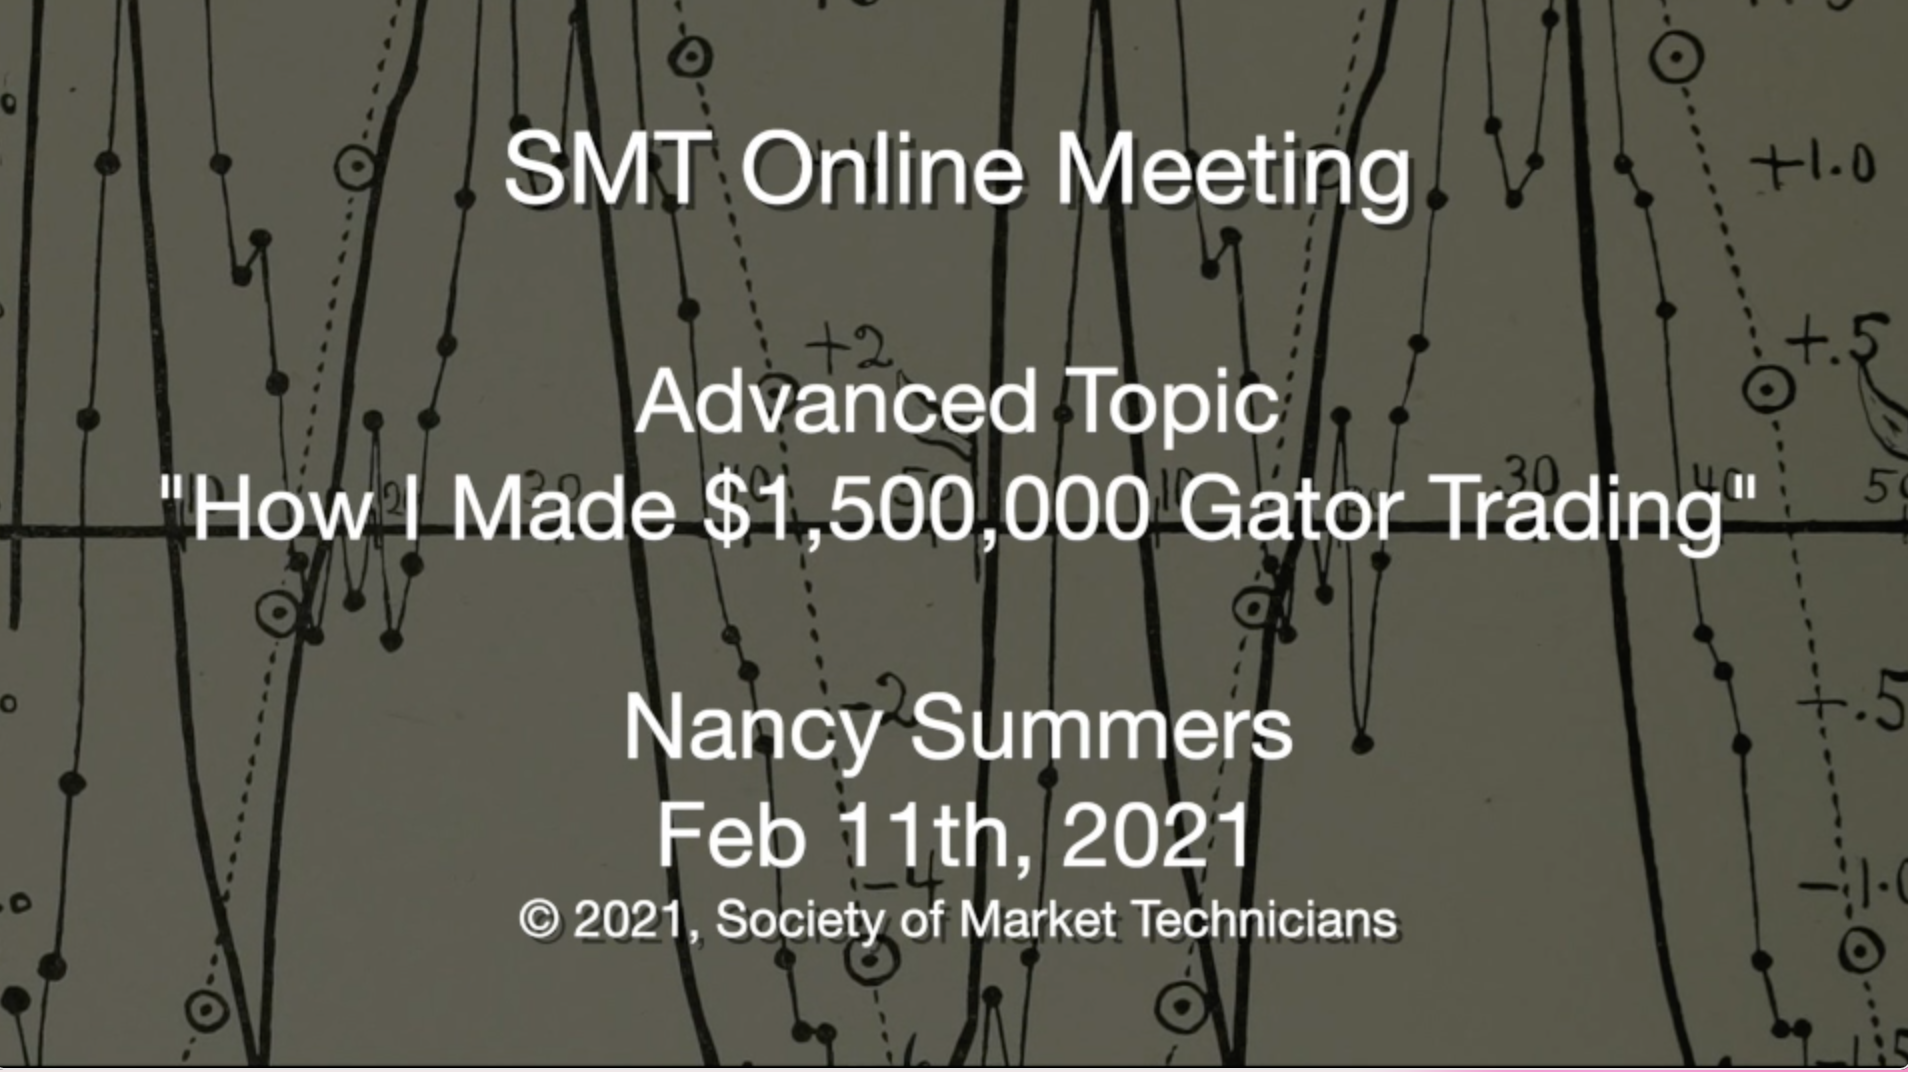 Advanced Topic: How I Made $1,500,000 Gator Trading